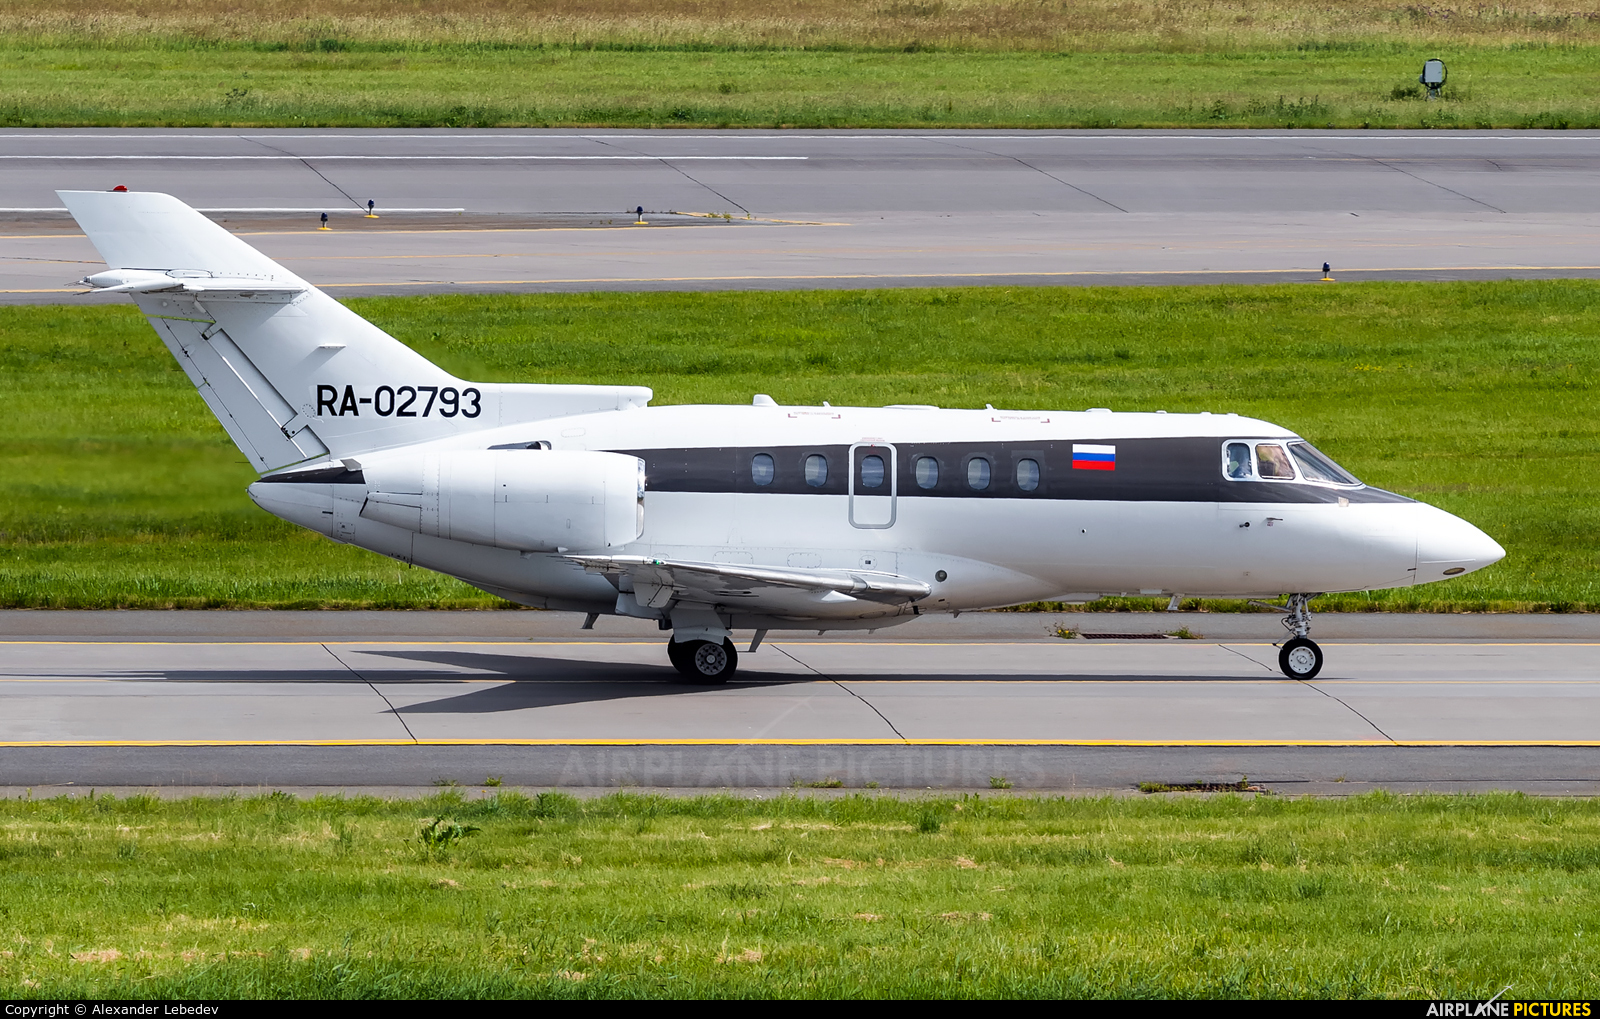 Weltall Avia RA-02793 aircraft at St. Petersburg - Pulkovo